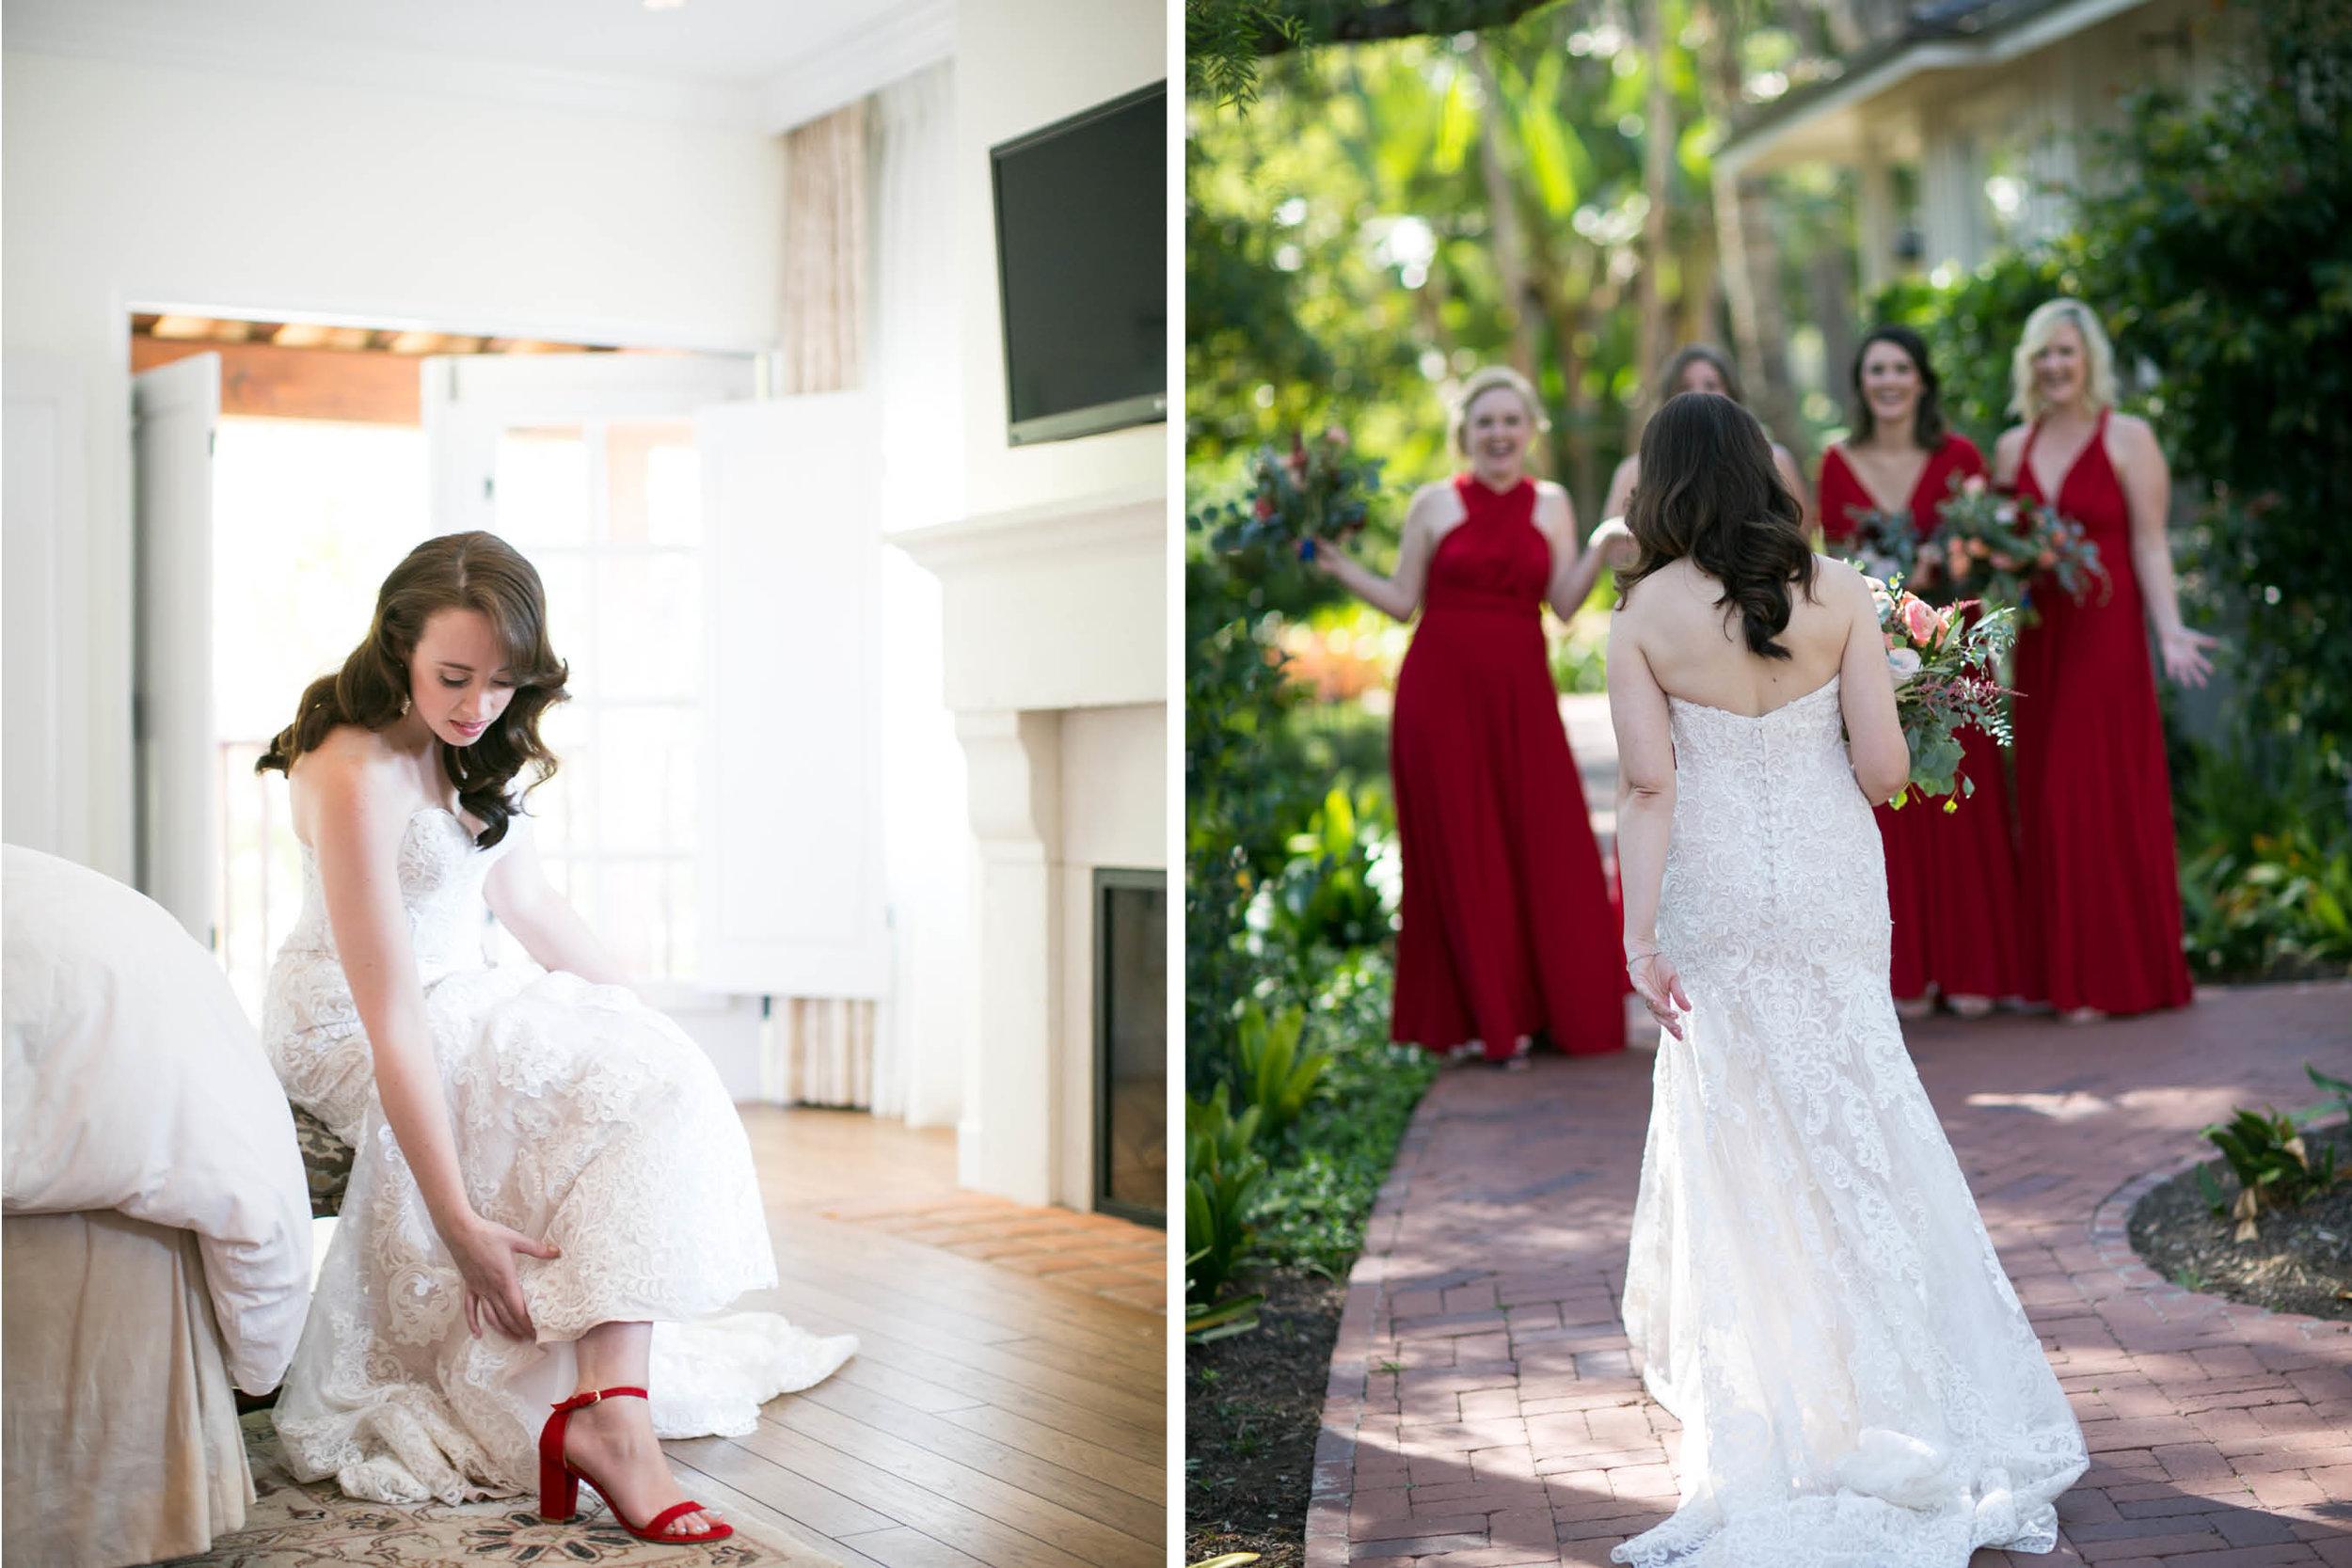 alegria-by-design-wedding-planner-planning-coordination-day-of-event-design-el-encanto-resort-riviera-garden-lily-pond-outdoor-red-navy (2).jpg